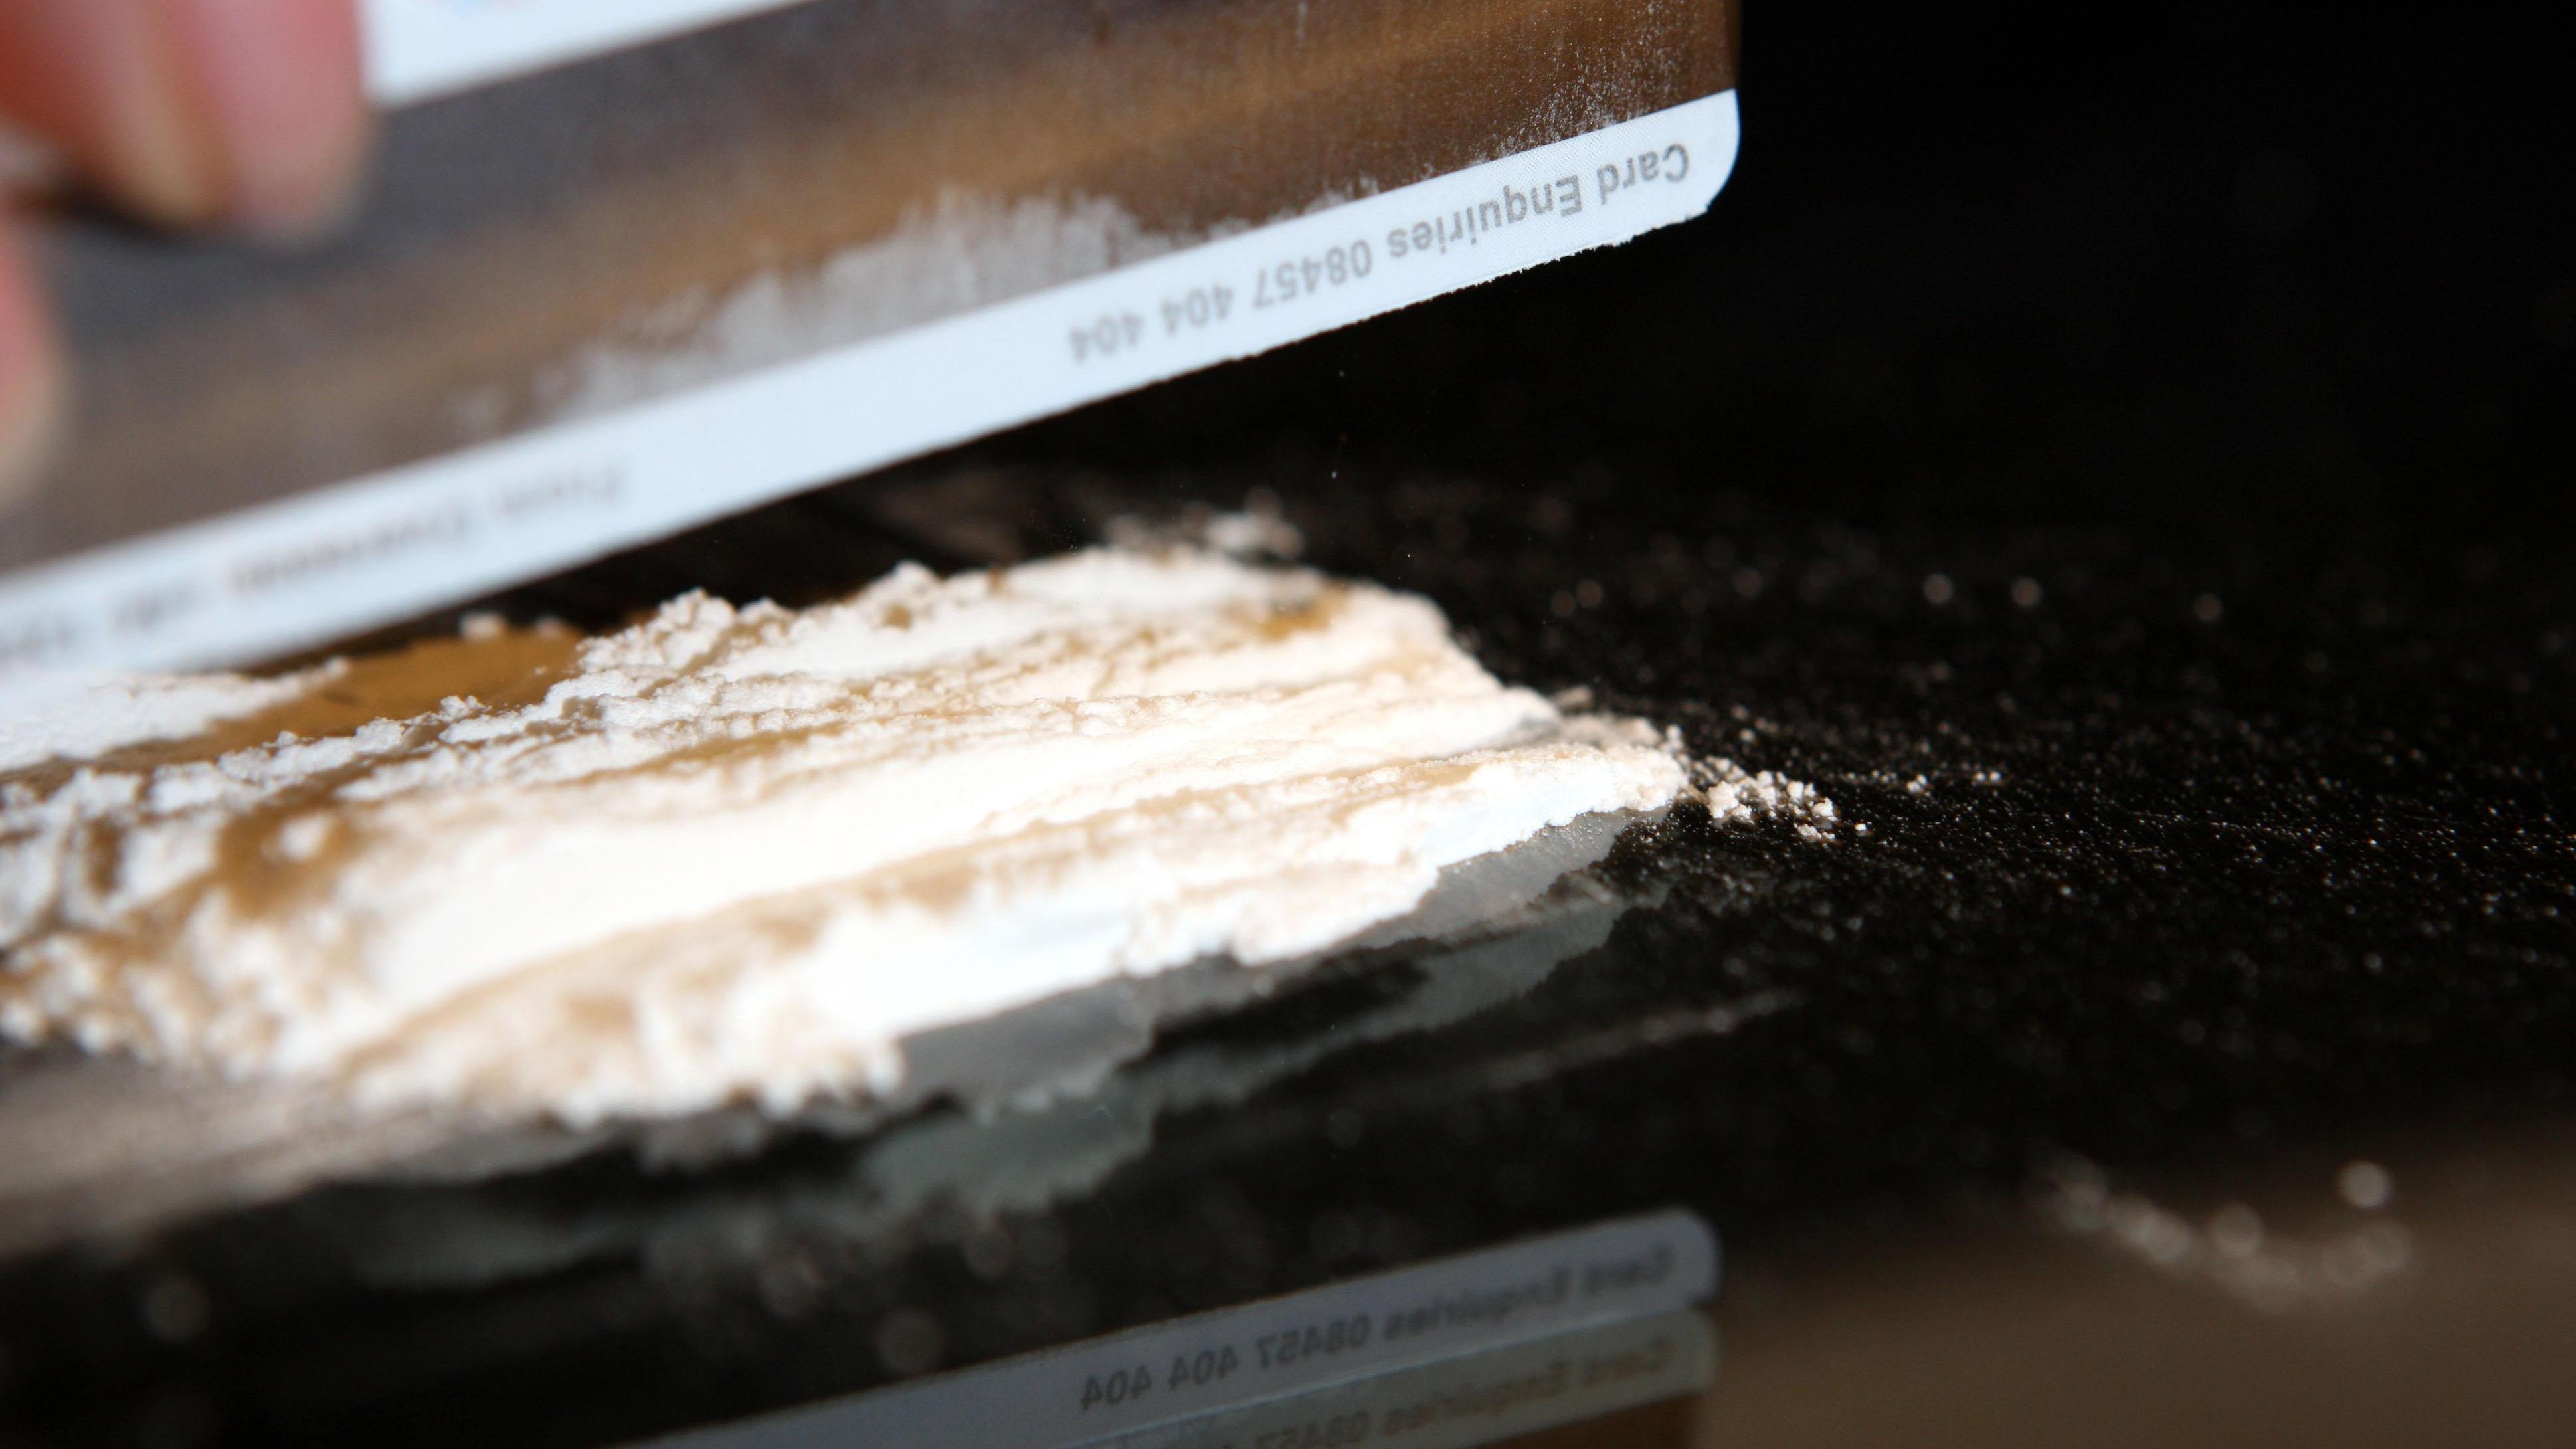 Drug Experts Warn Of 'Super-Strength Ketamine' On Sale In The UK